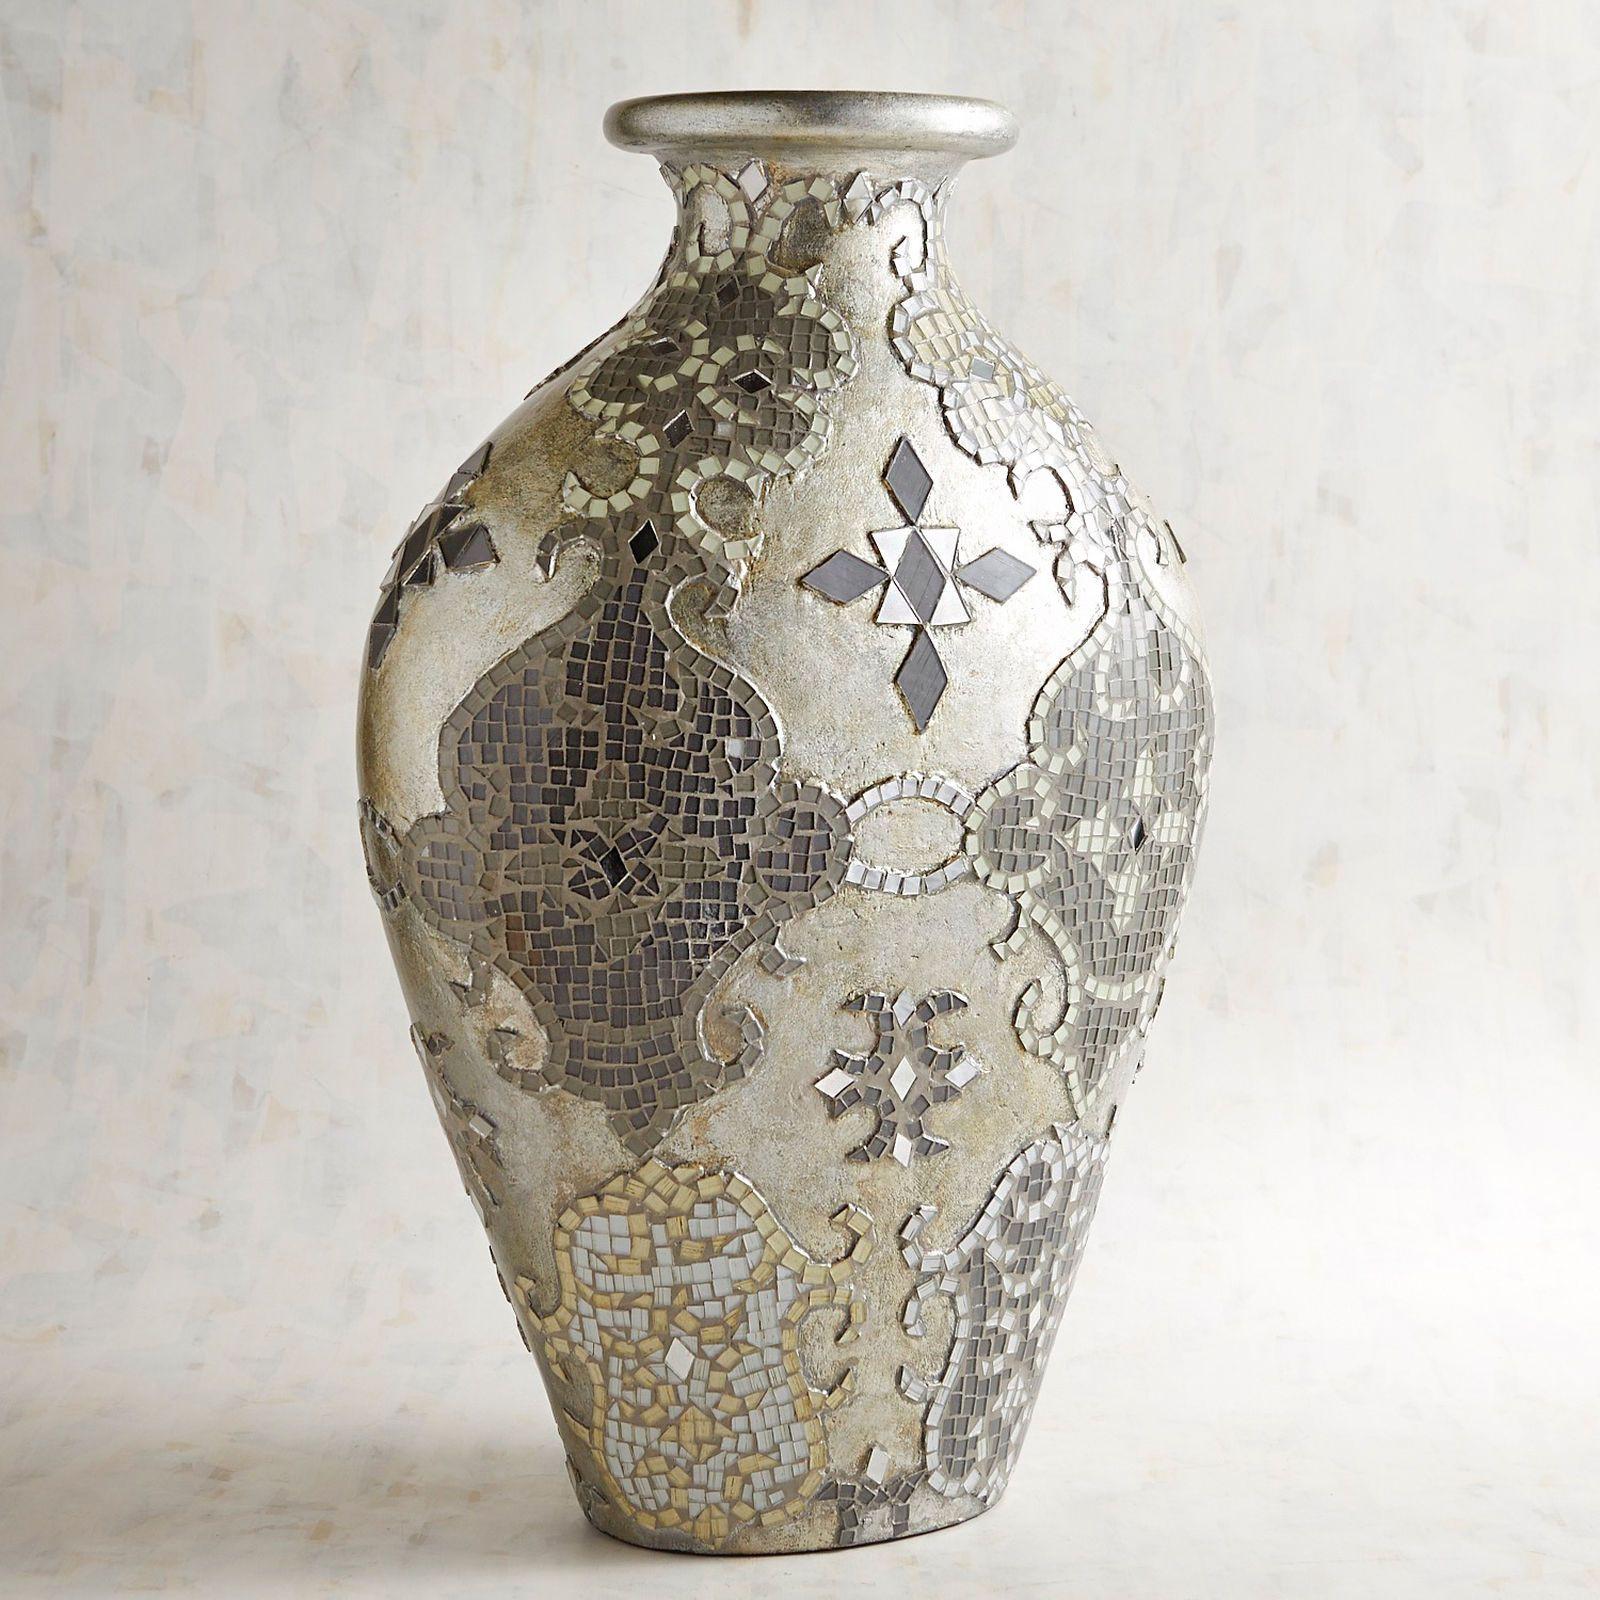 pier 1 blue vase of silver gray mosaic vase mosaic vase and mosaics regarding silver gray mosaic vase pier 1 imports